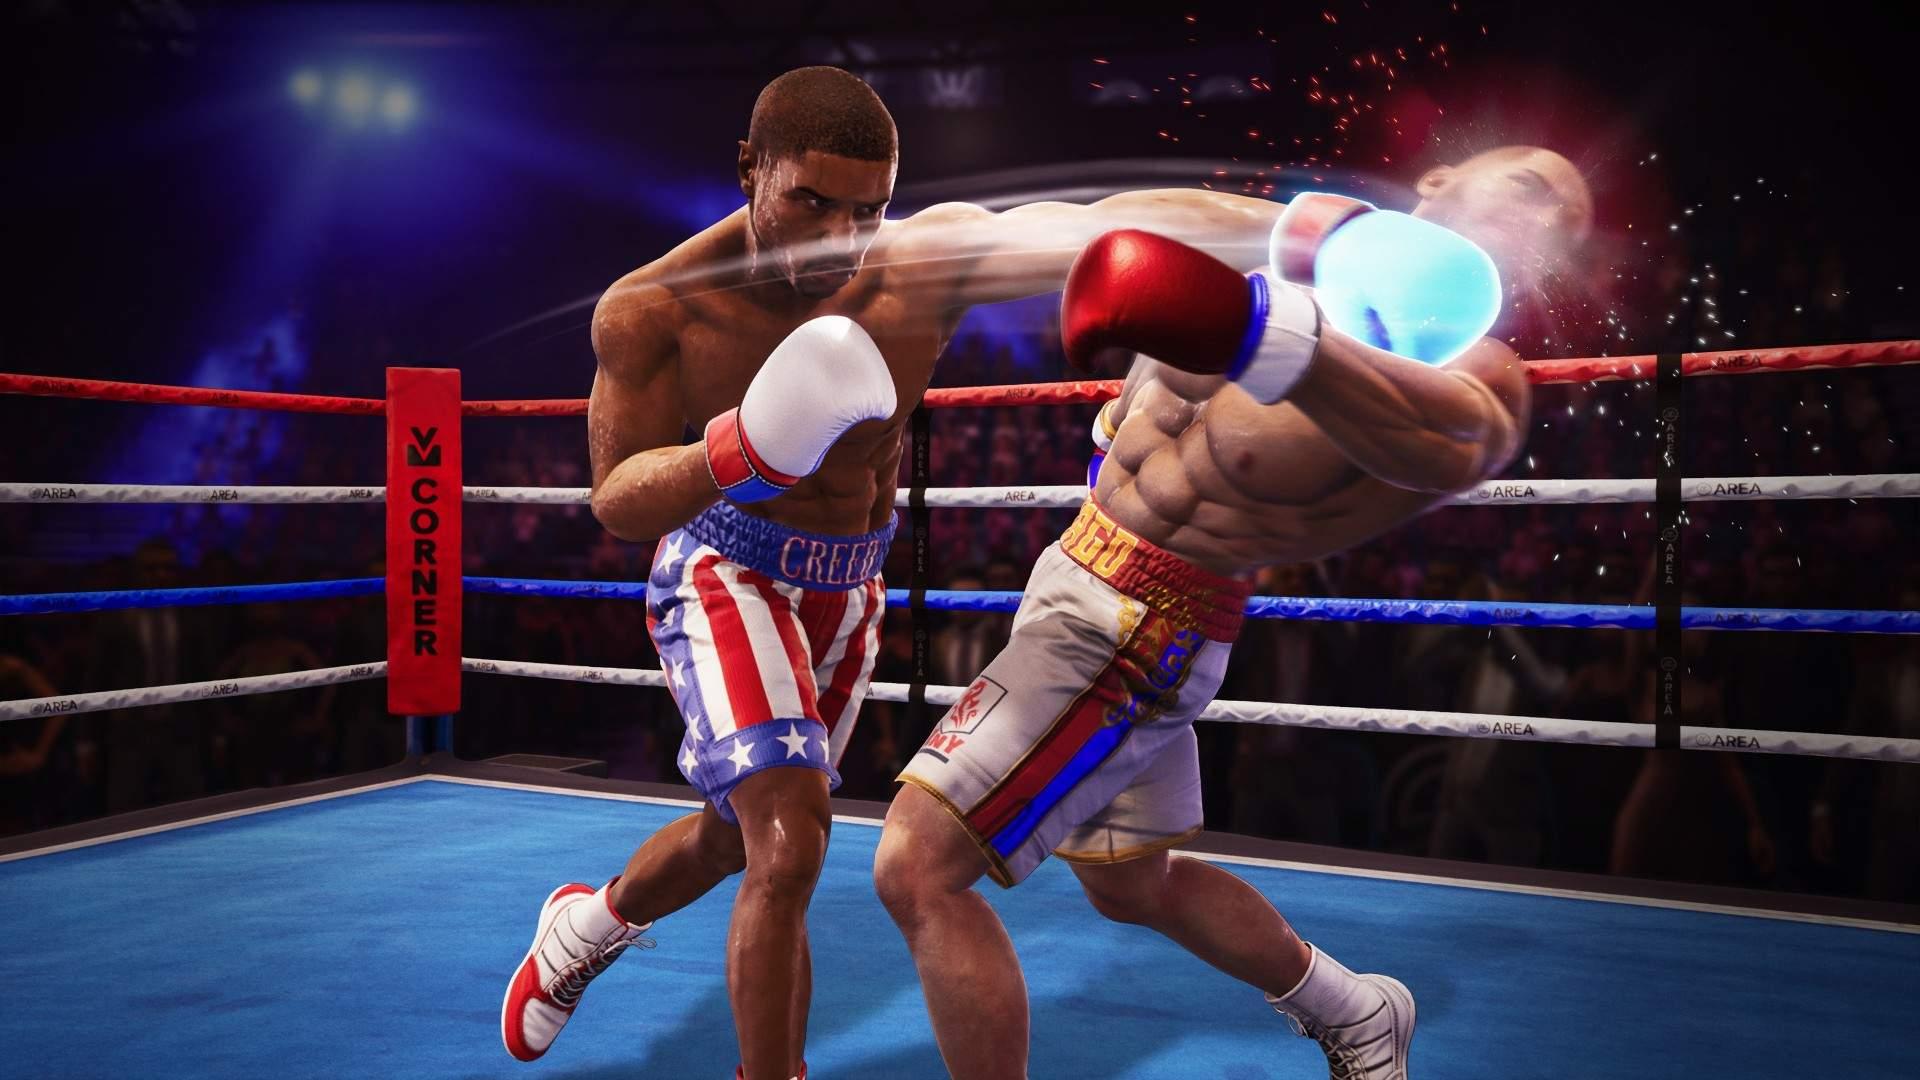 Big Rumble 拳击:Creed Champions - 3 月 XNUMX 日